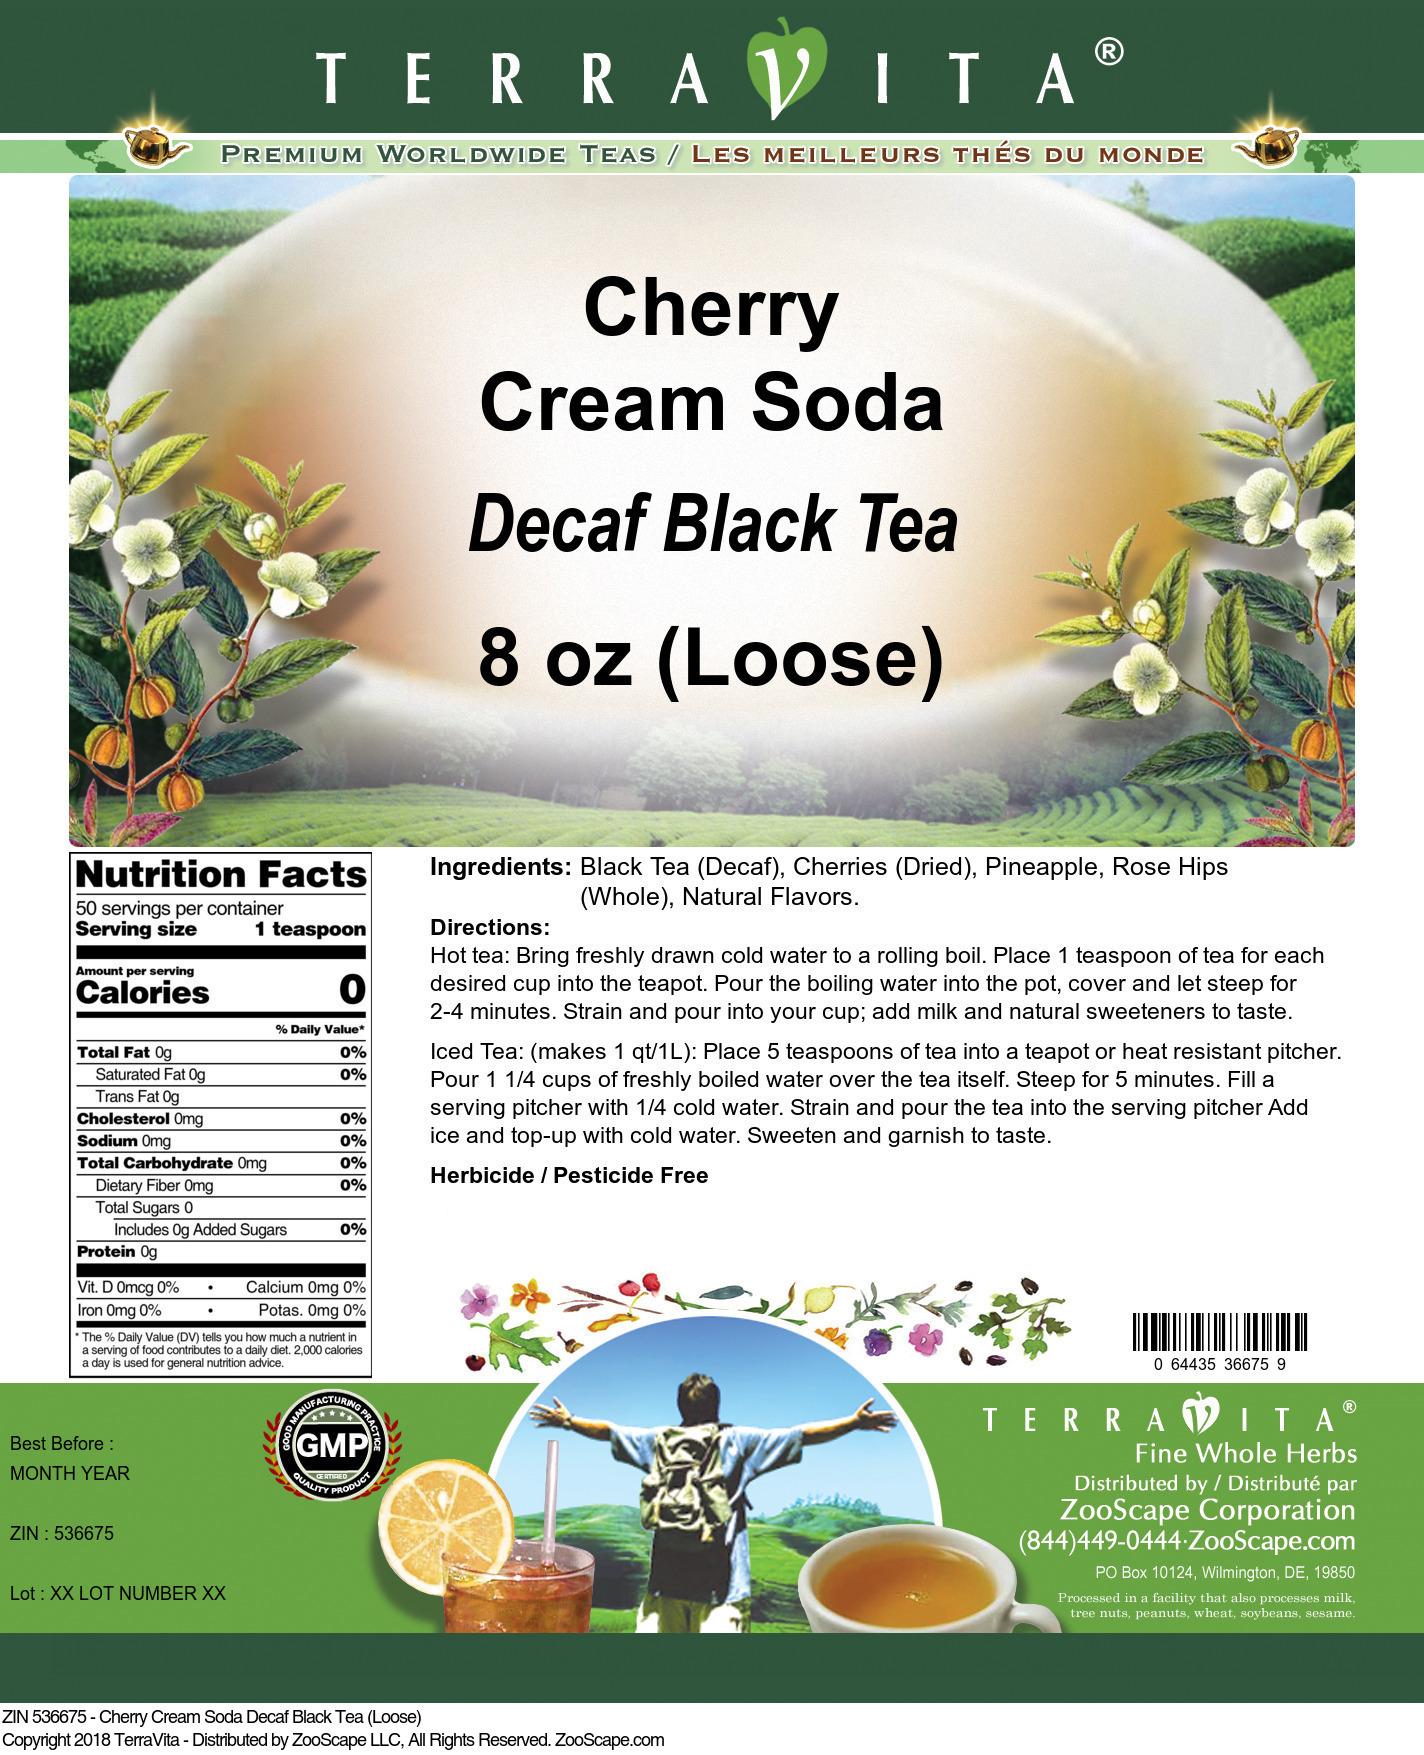 Cherry Cream Soda Decaf Black Tea (Loose)